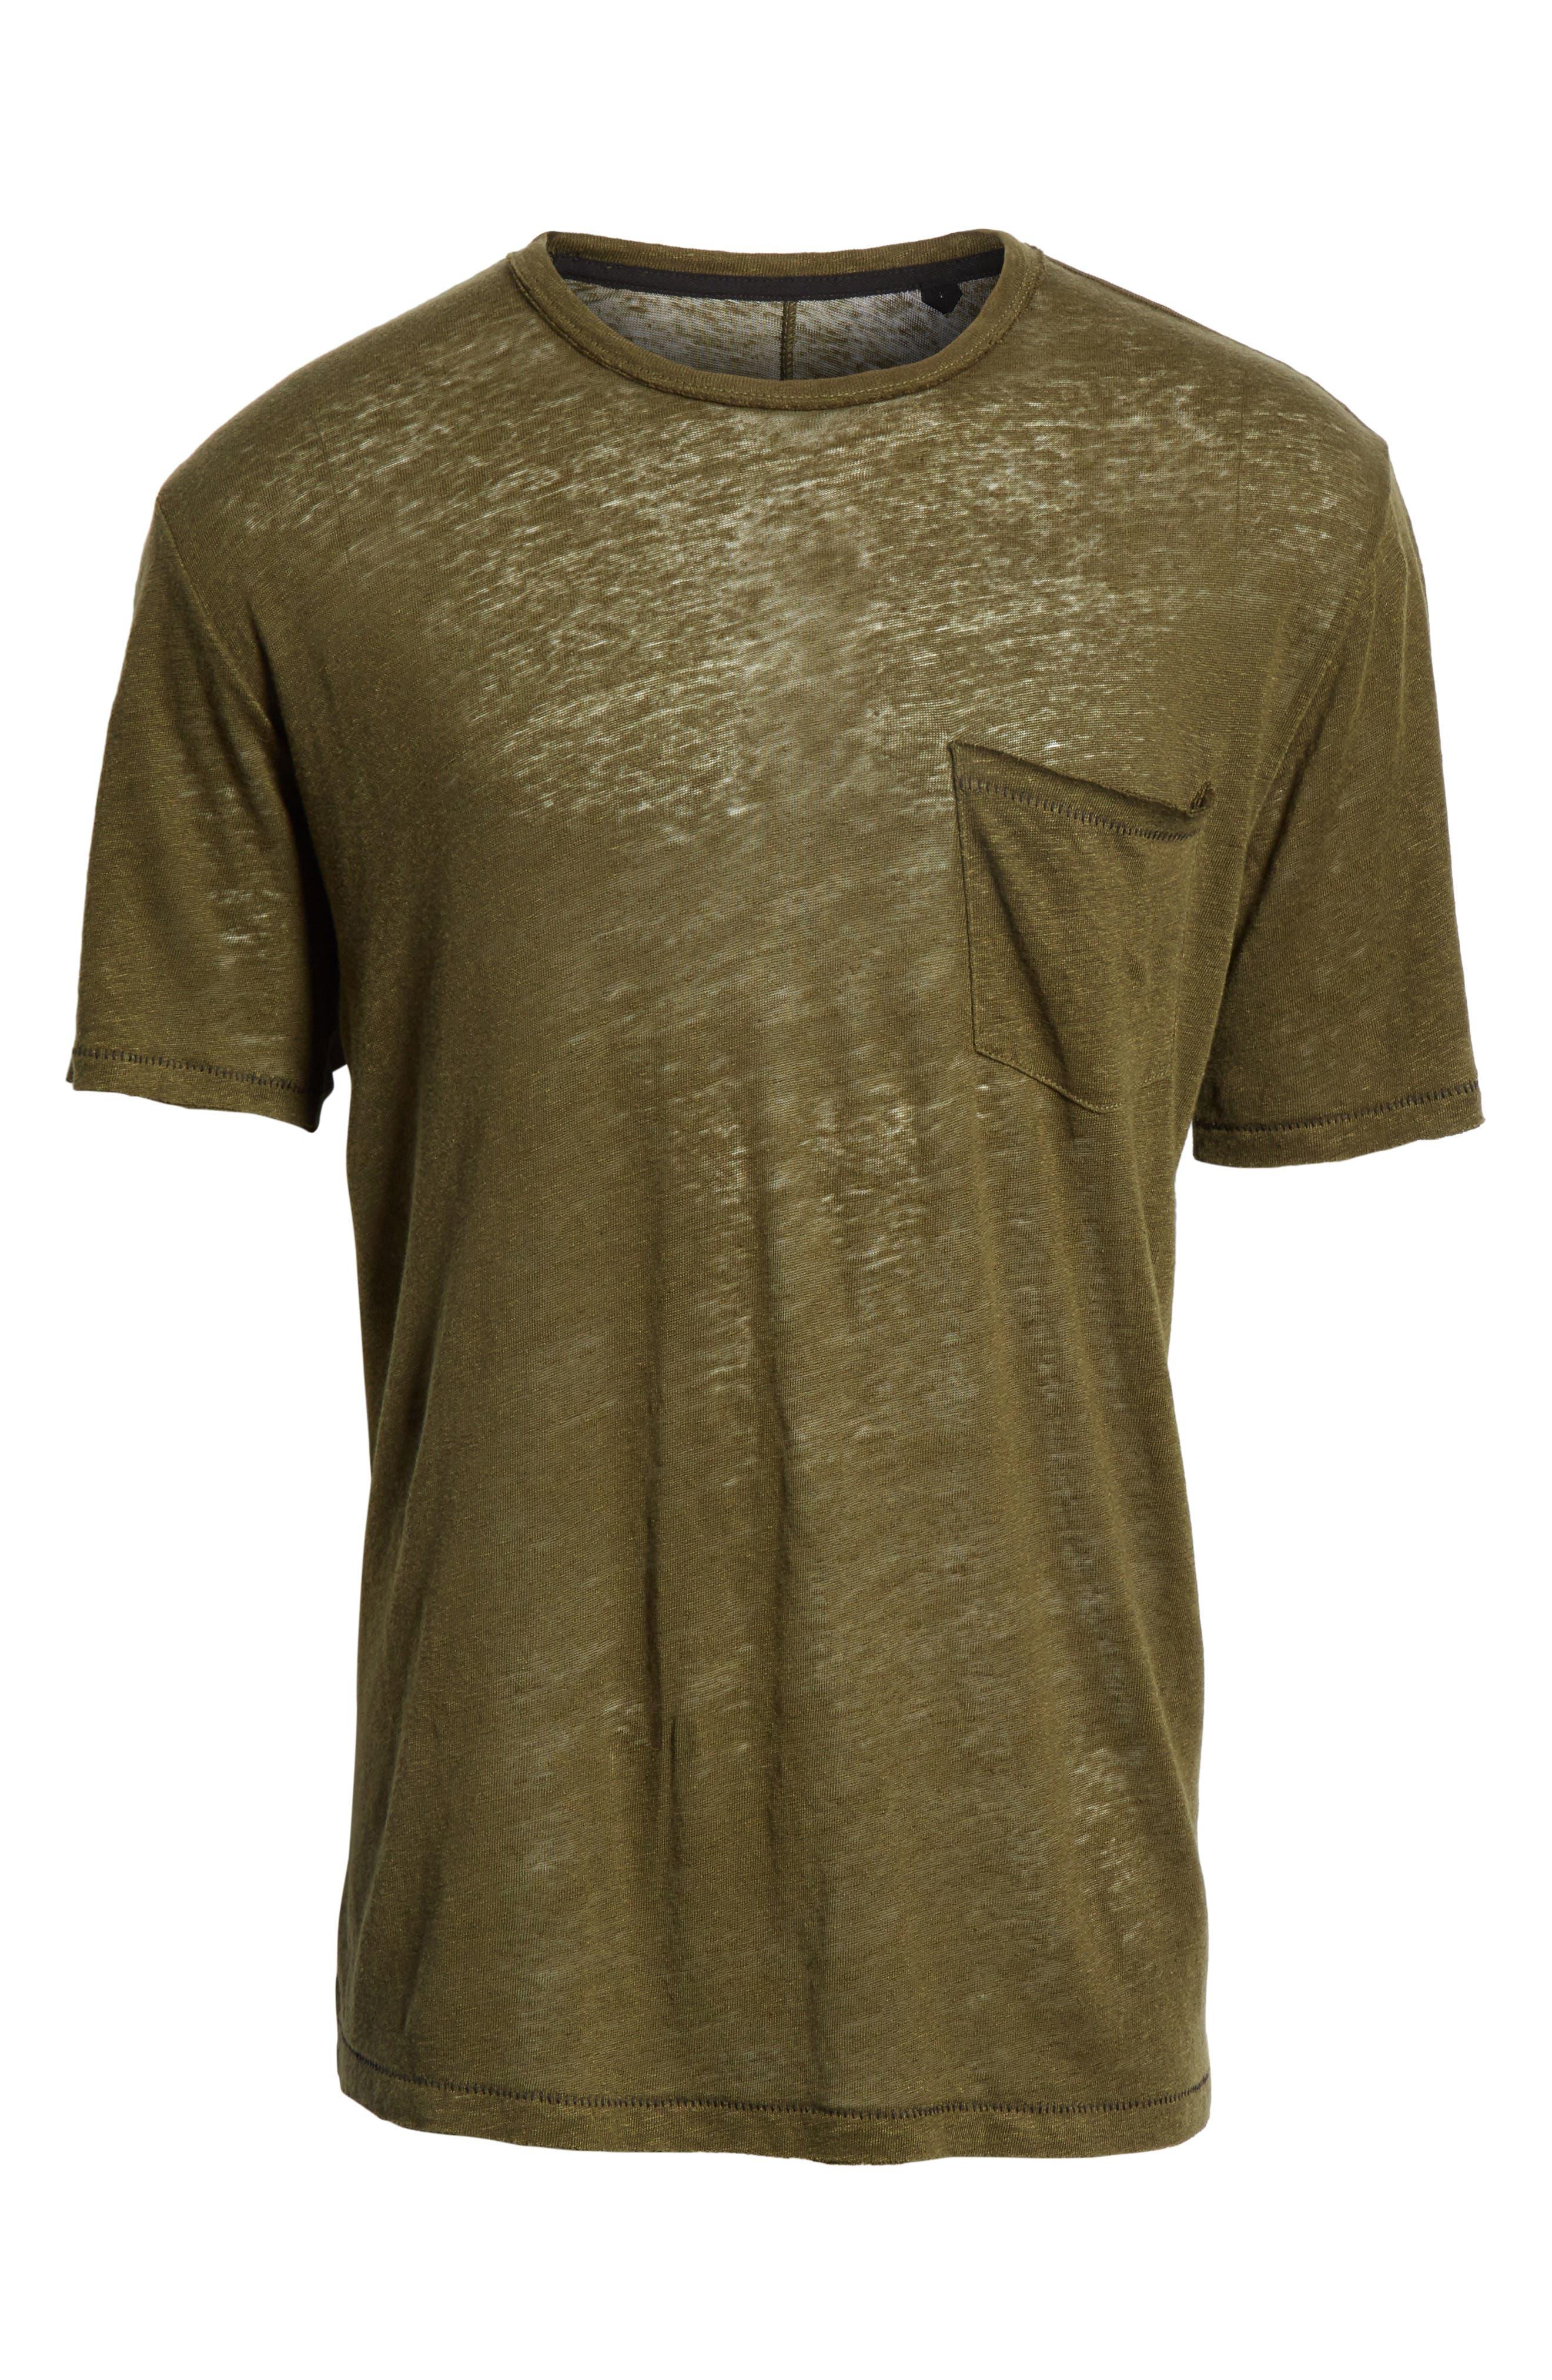 Owen T-Shirt,                             Alternate thumbnail 6, color,                             Army